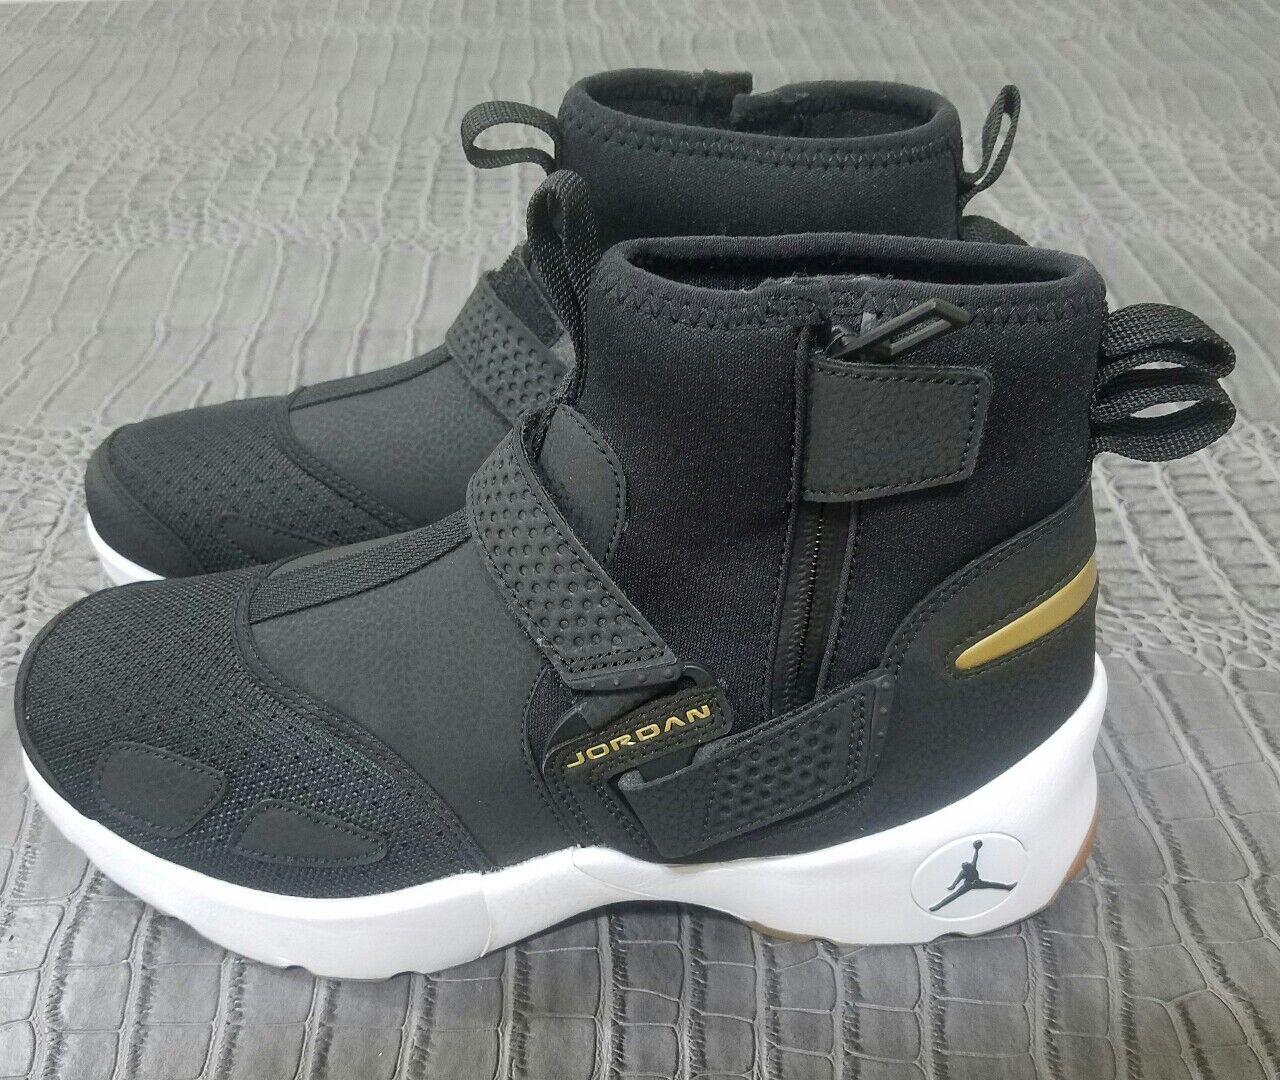 cheap for discount a351f 86d4e Nike Air Jordan High Black White Gold Gum Sole Sole Sole MENS NEW Size 9  Trunner